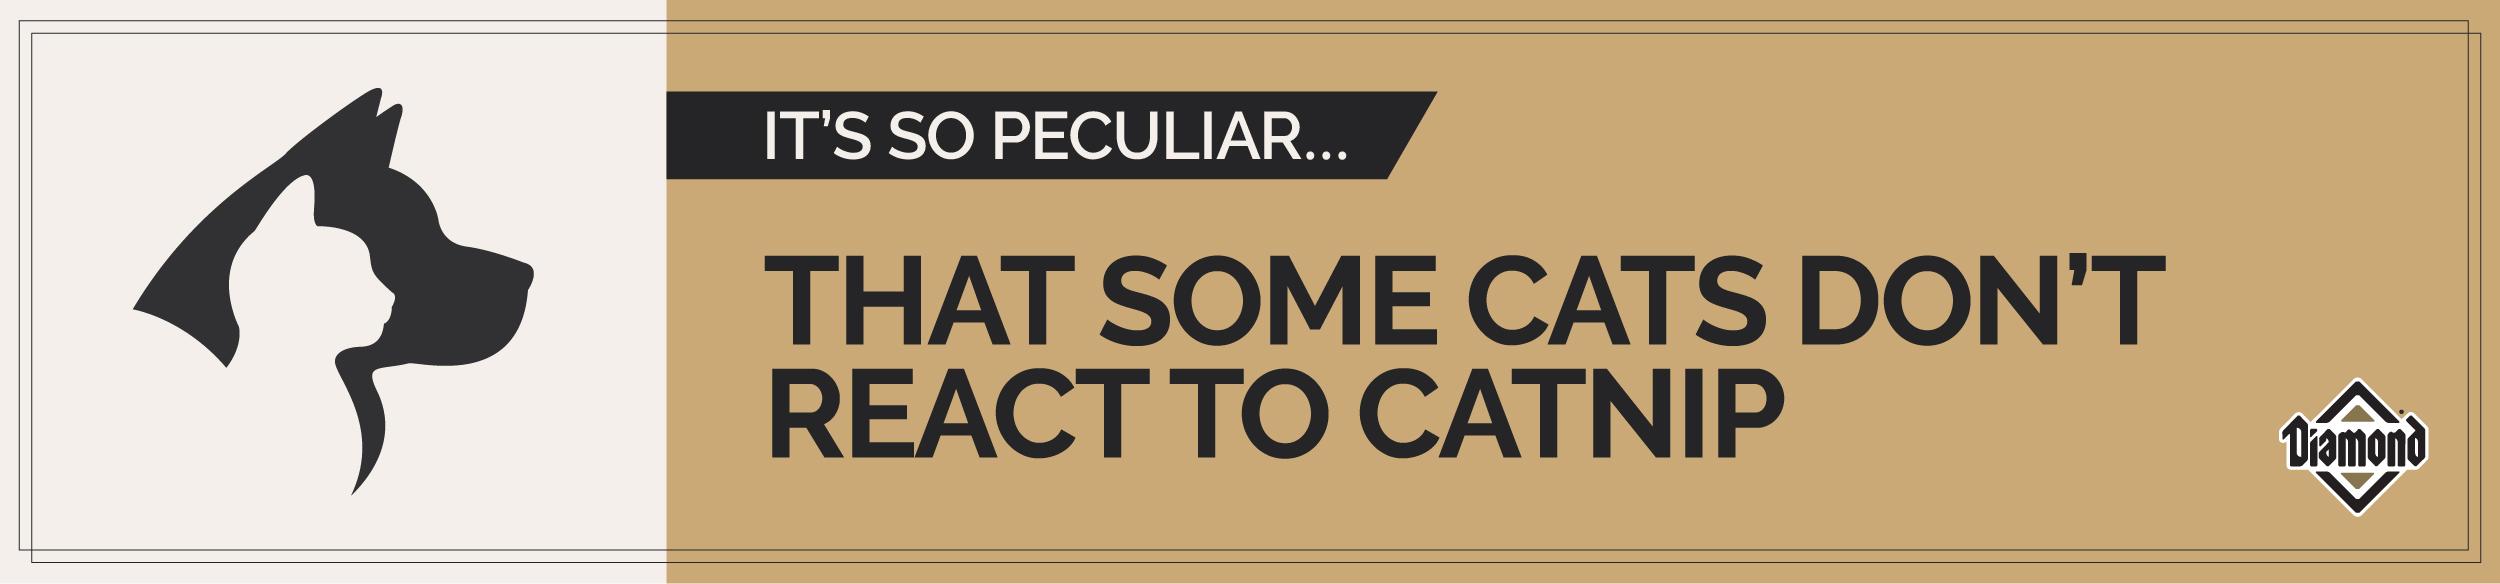 Catnip Text Banner | Diamond Pet Foods